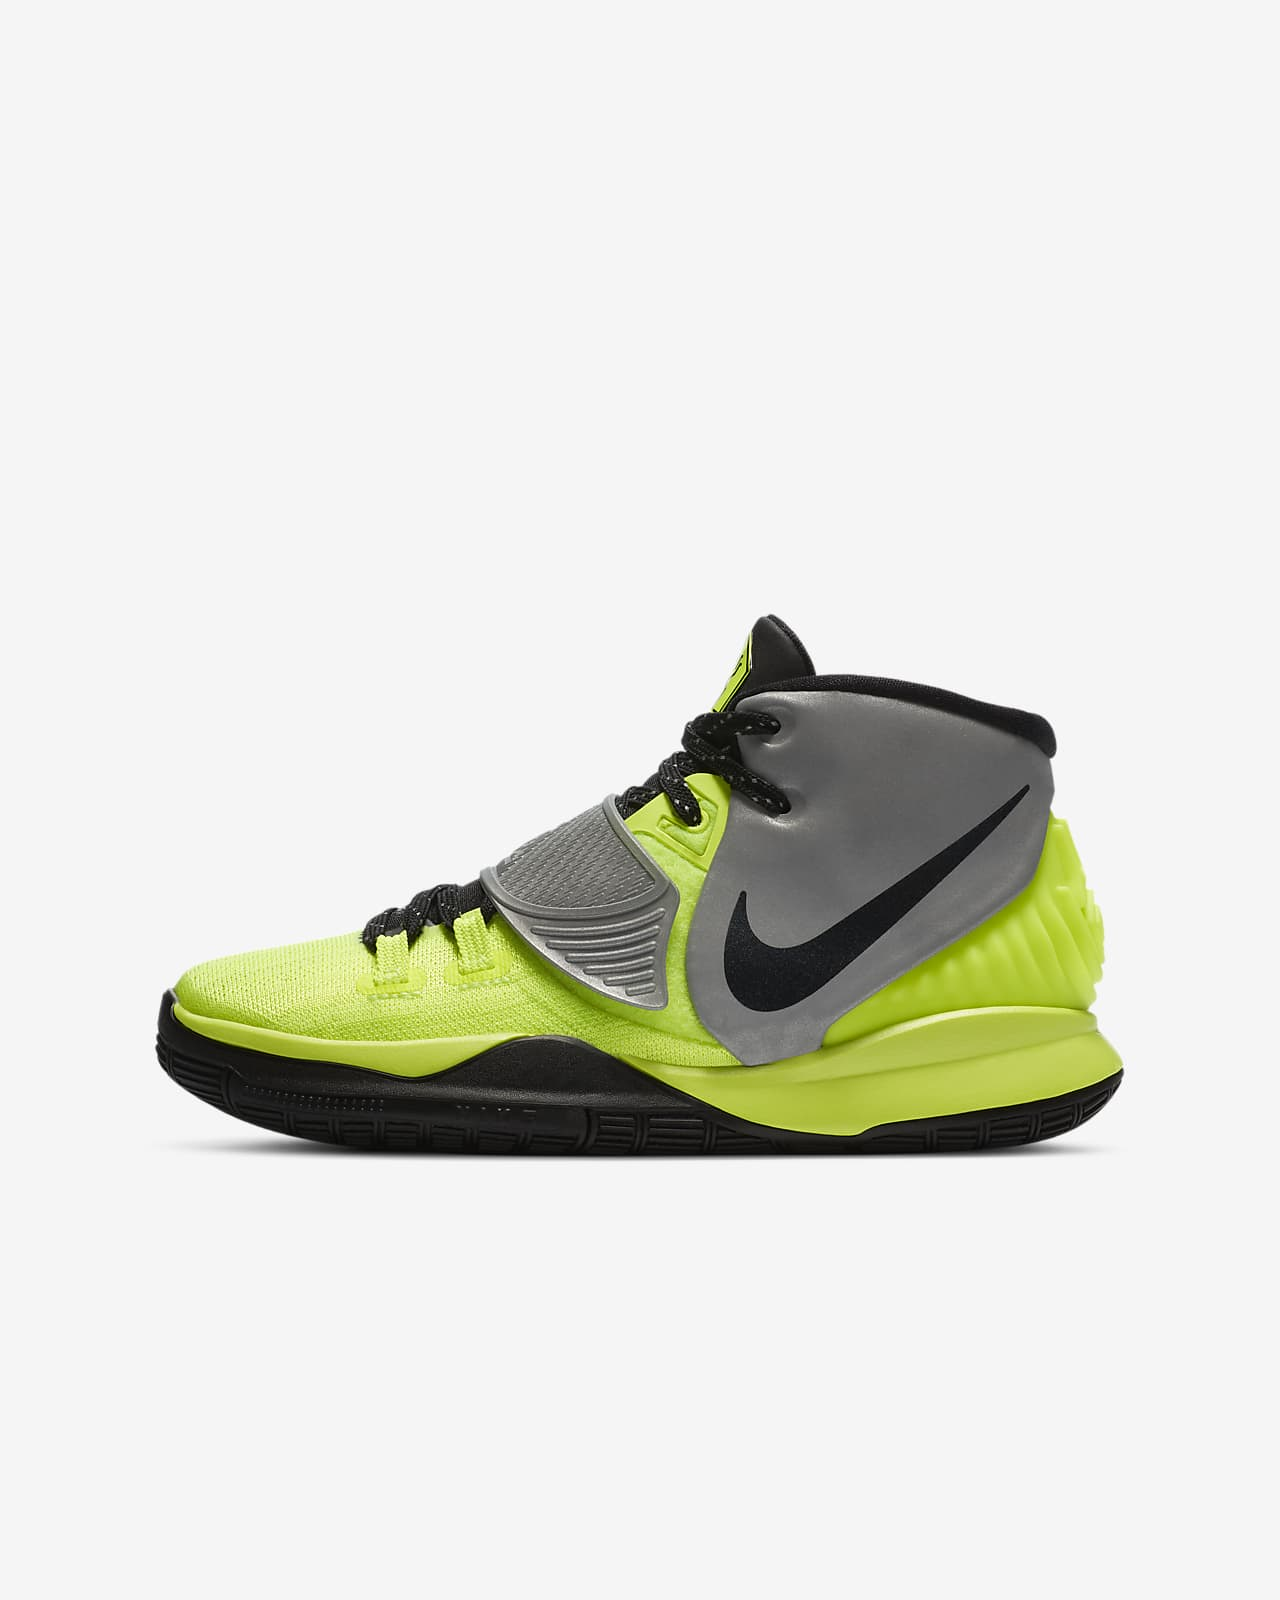 Kyrie 6 Cross Big Kids' Basketball Shoe